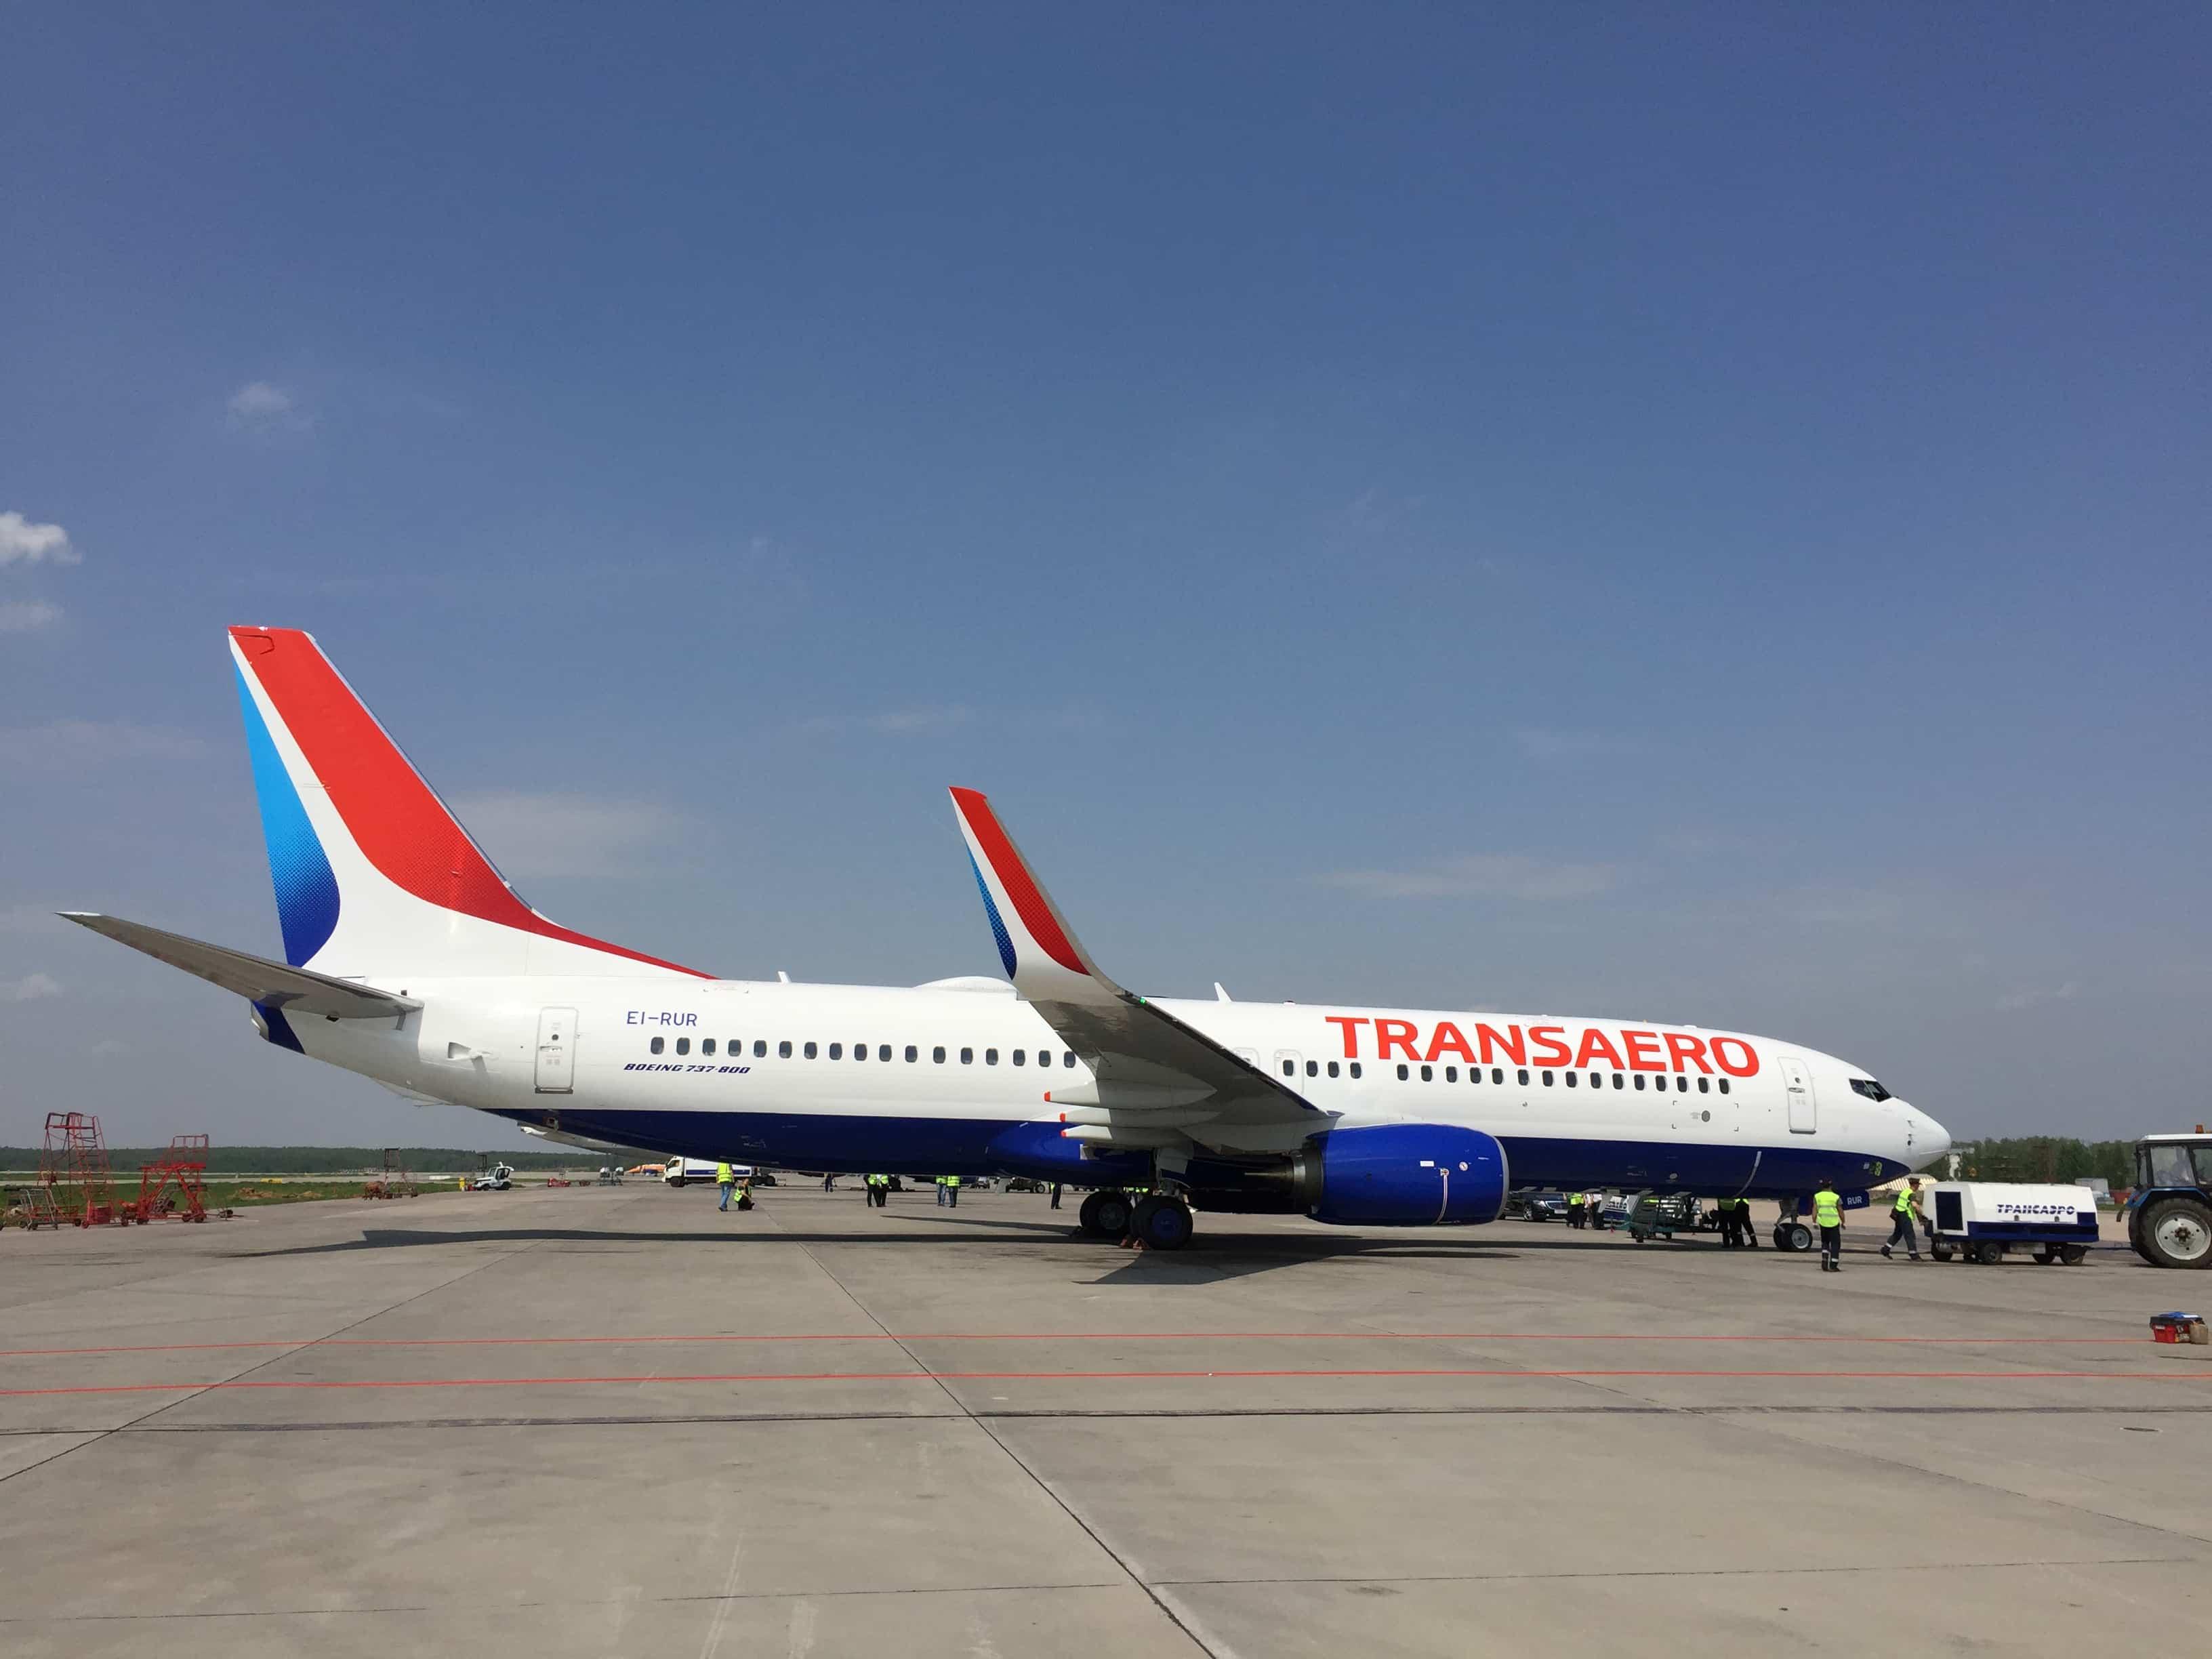 Transaero-737-800-new-livery